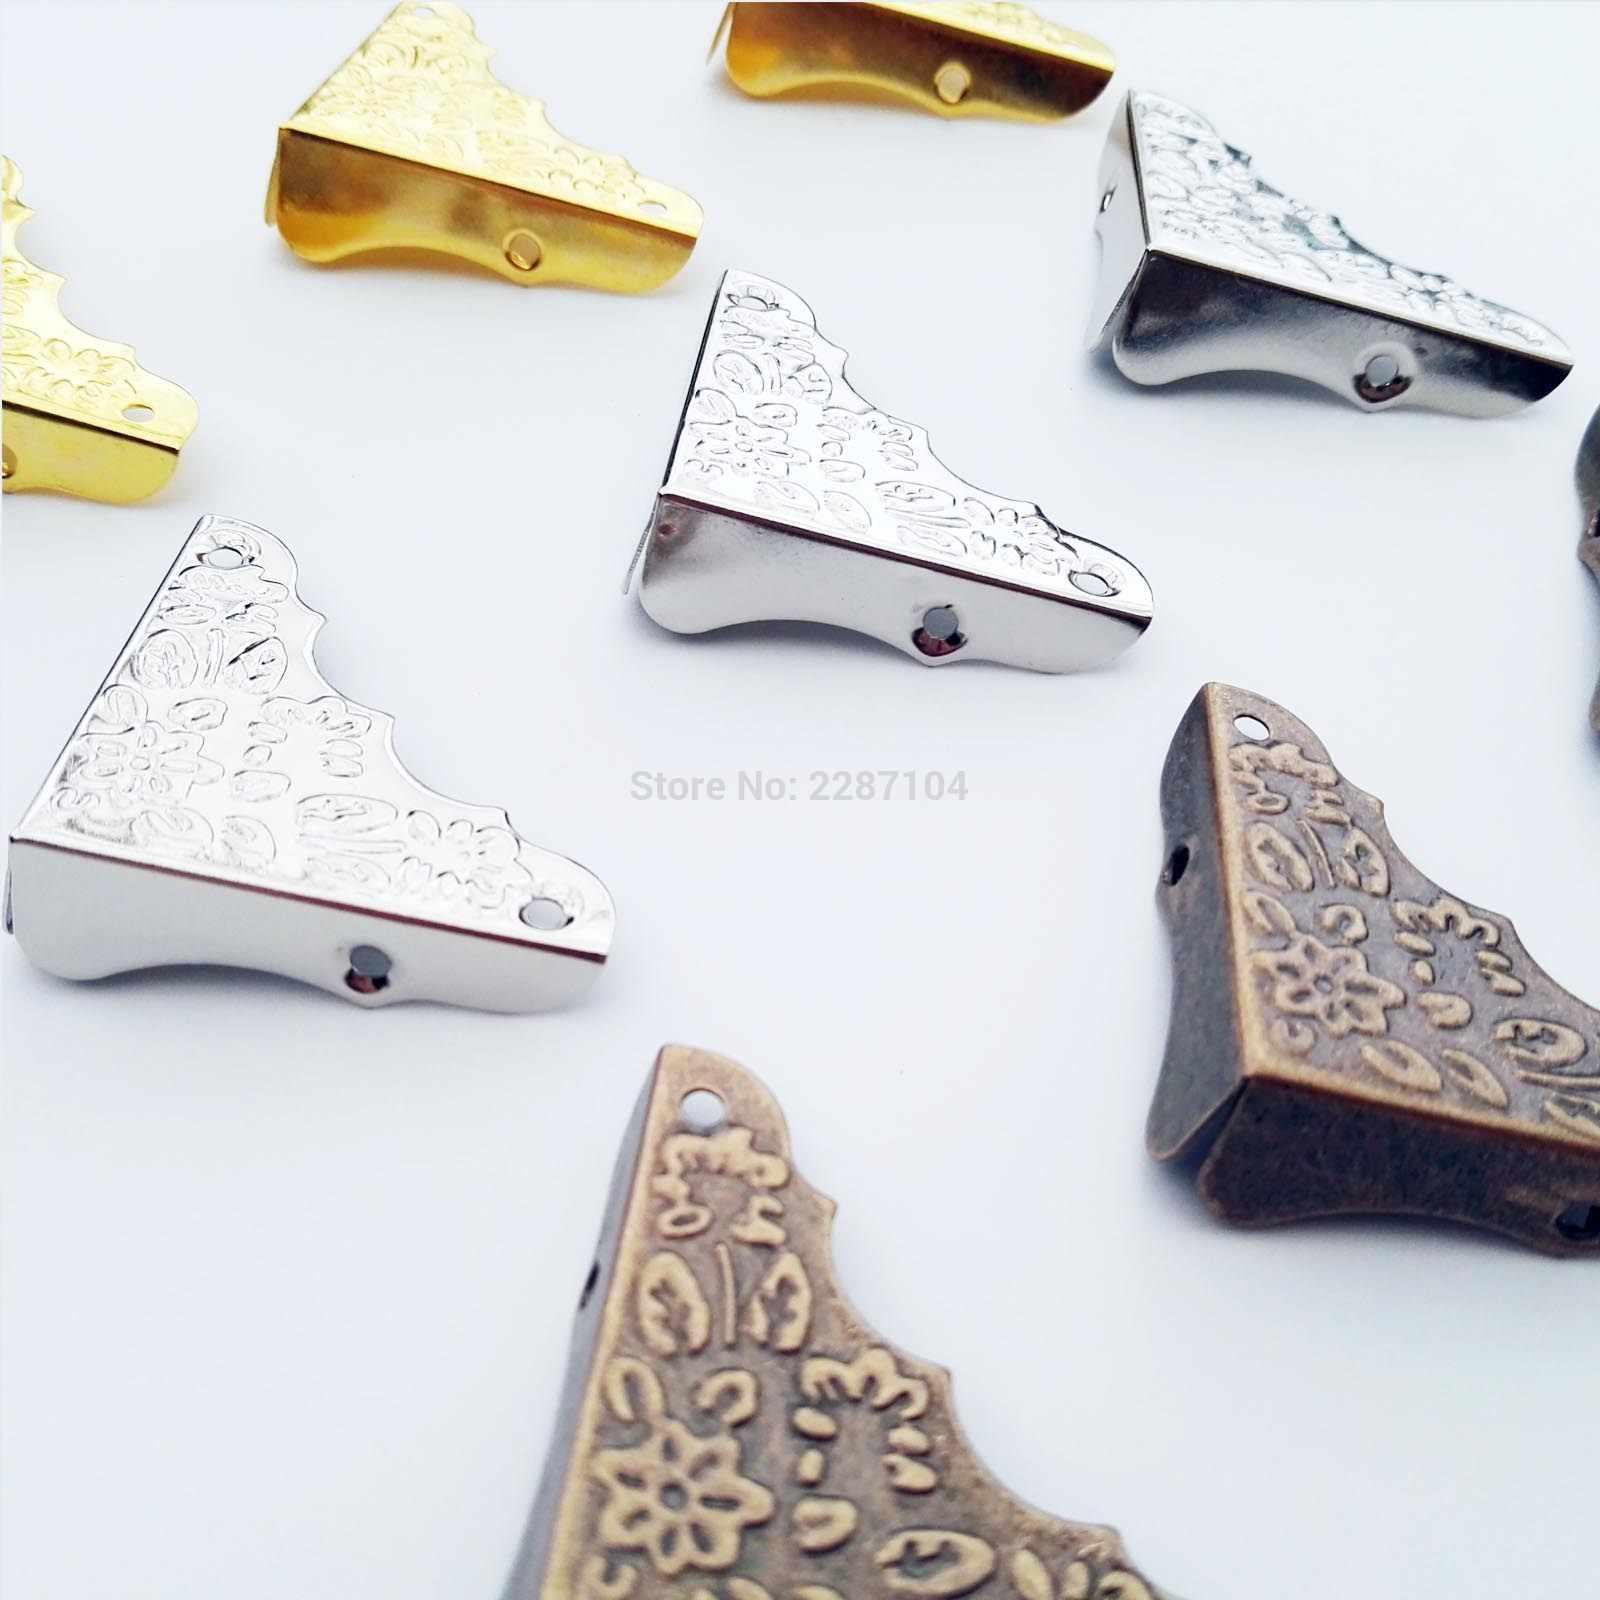 12pc Metal Decorative Jewelry Chest Wine Box Wooden Table Desk Picture Photo Frame furniture Edge Corner Protector Guard +Screws